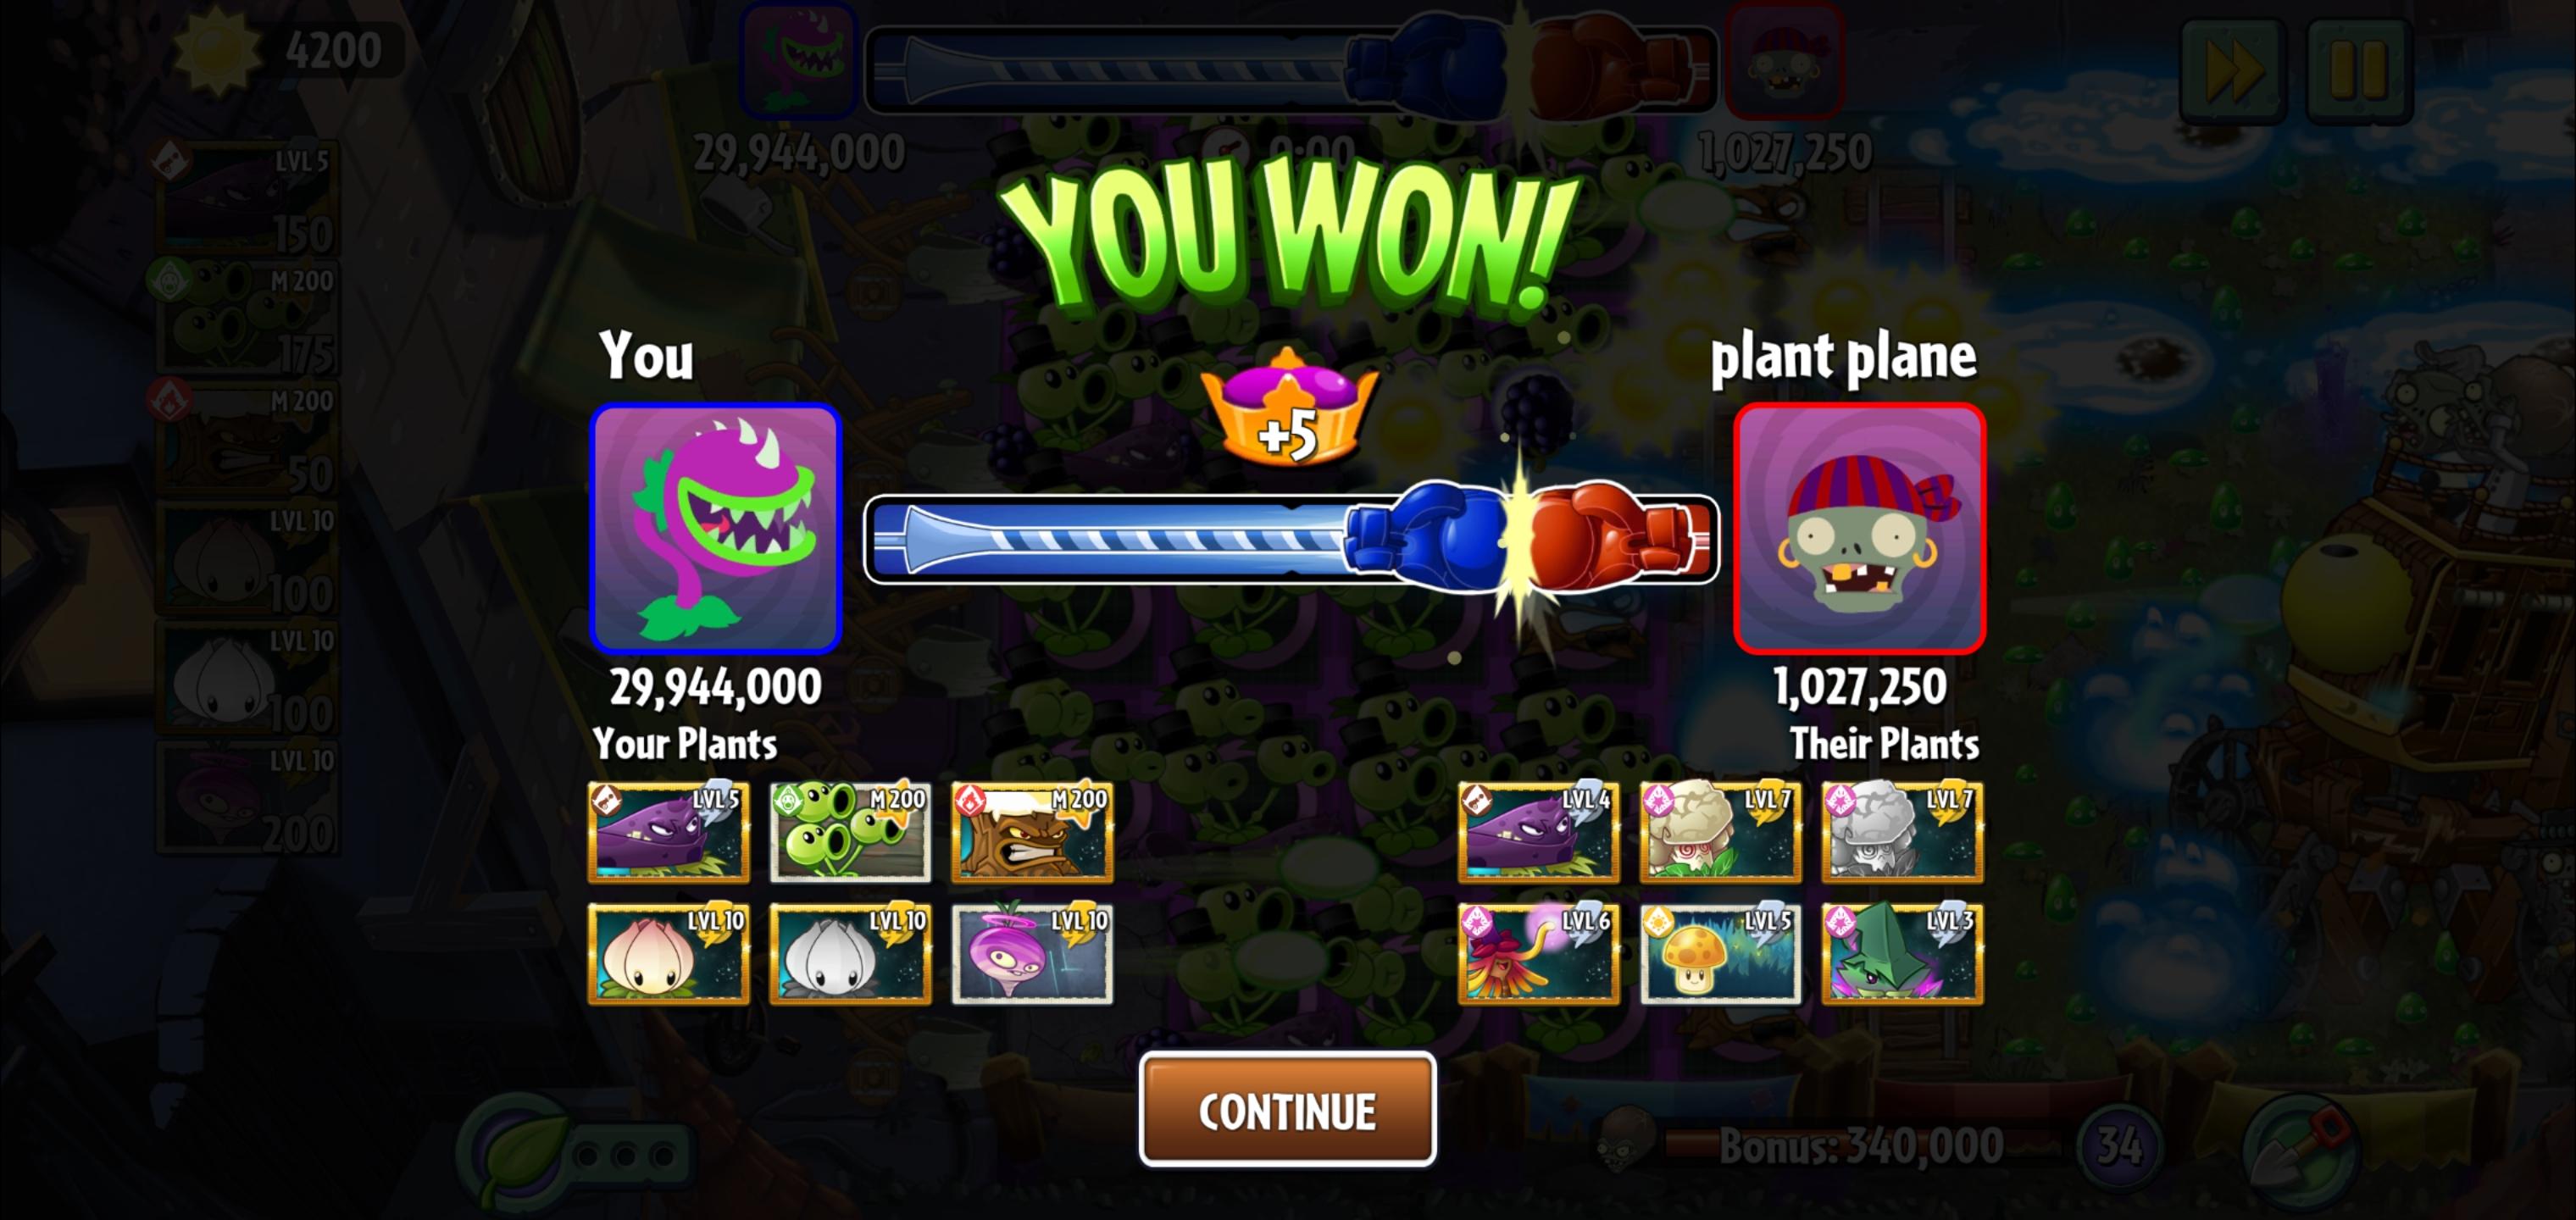 Screenshot_20190909-115843_Plants Vs Zombies 2.jpg